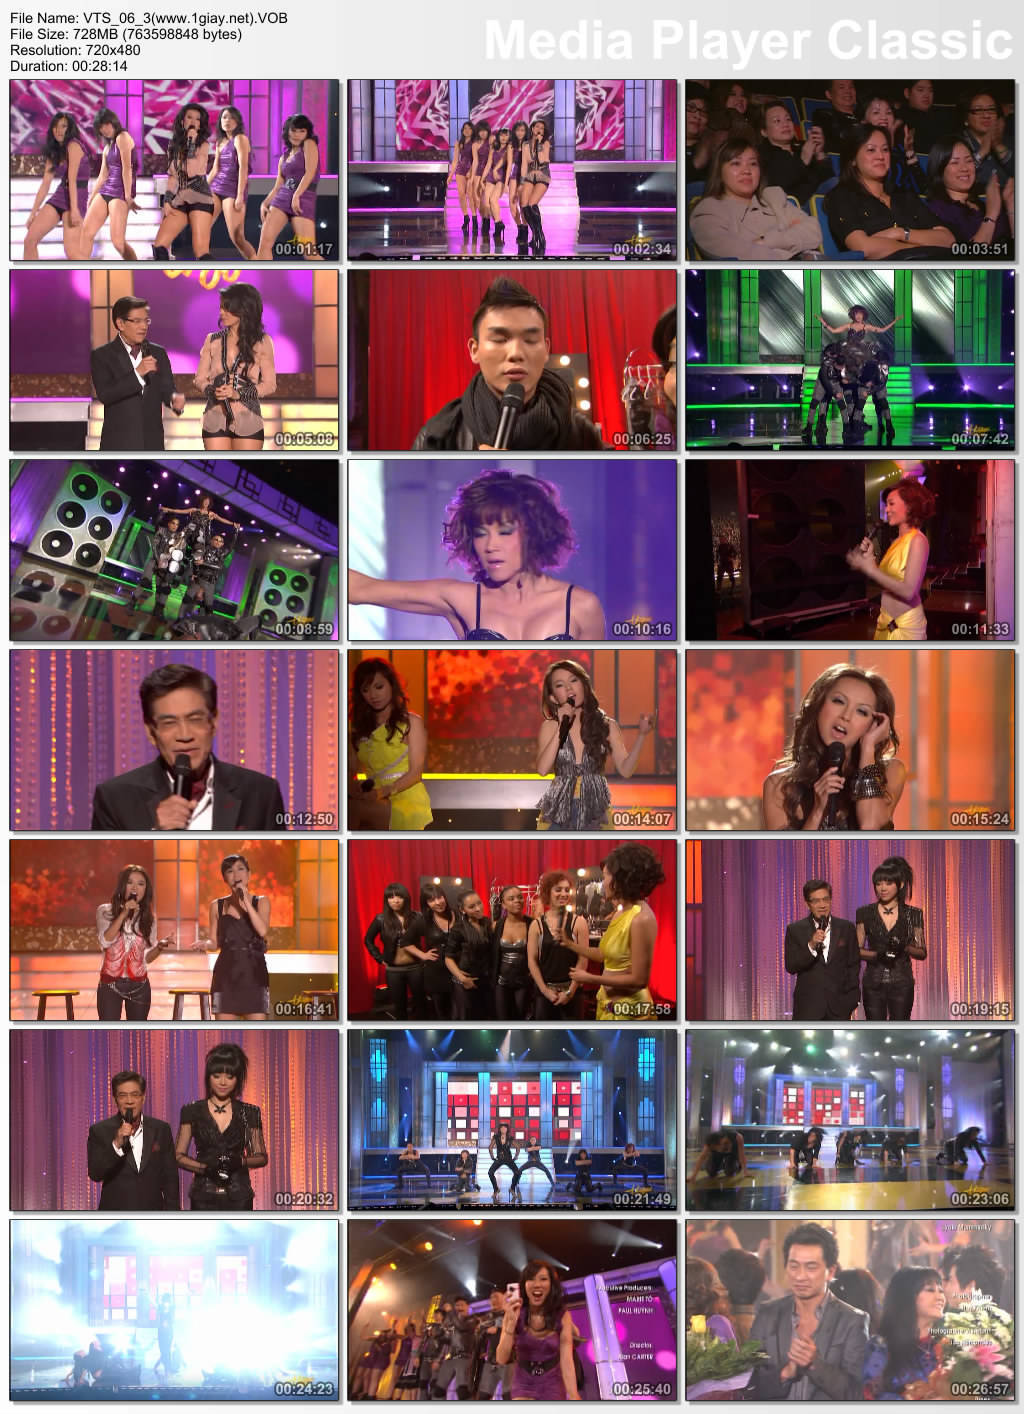 Paris by night divas hot hottttttttttttt trọn bộ DVD5 link MF  - Page 2 5610162073abf1bf0a46fb8ccaf1499f5b2d580